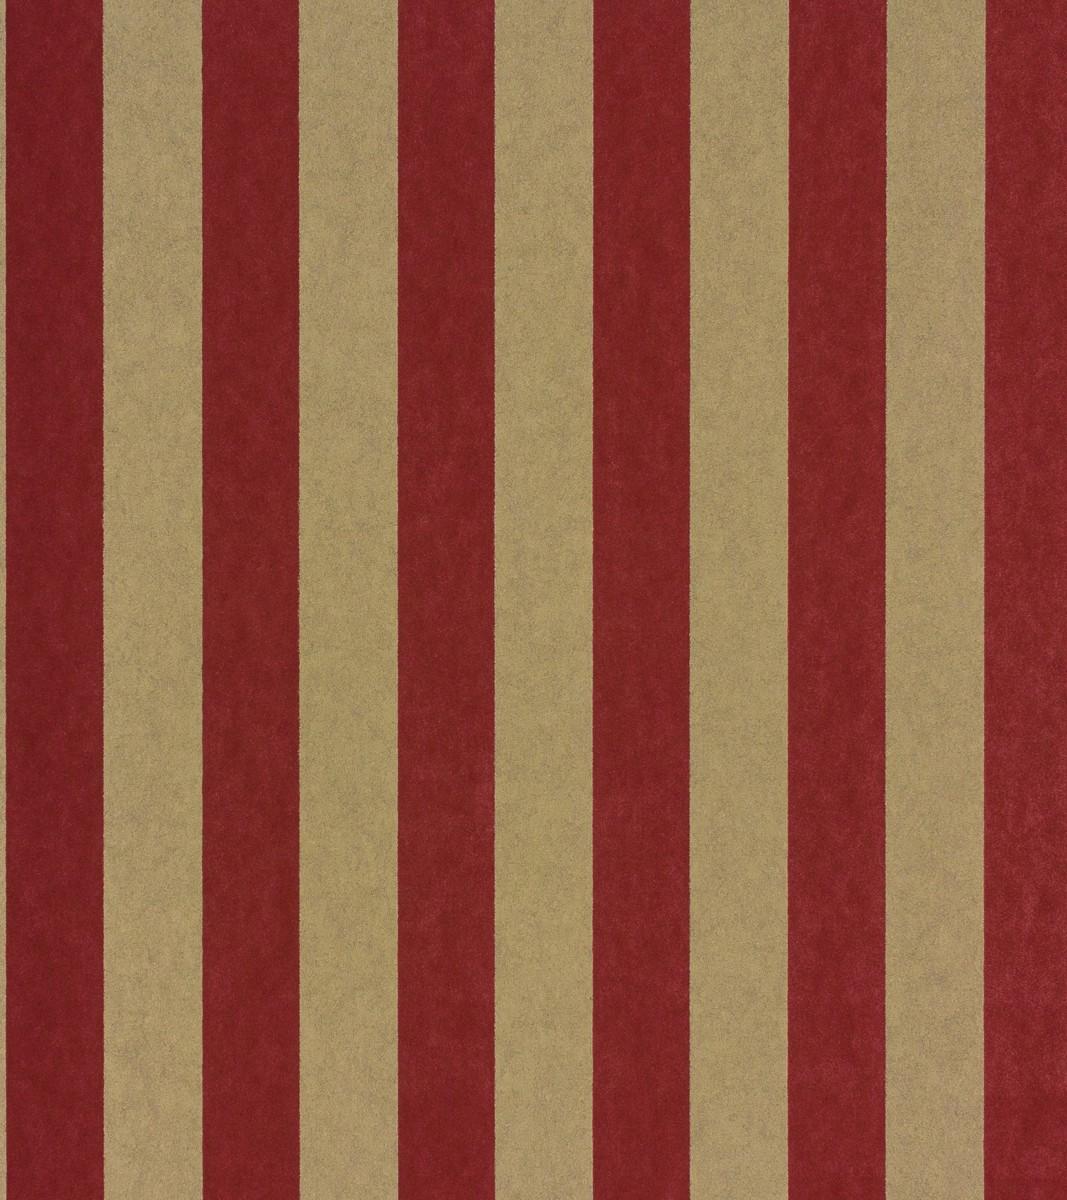 vliestapete rasch textil streifen rot gold 221595. Black Bedroom Furniture Sets. Home Design Ideas